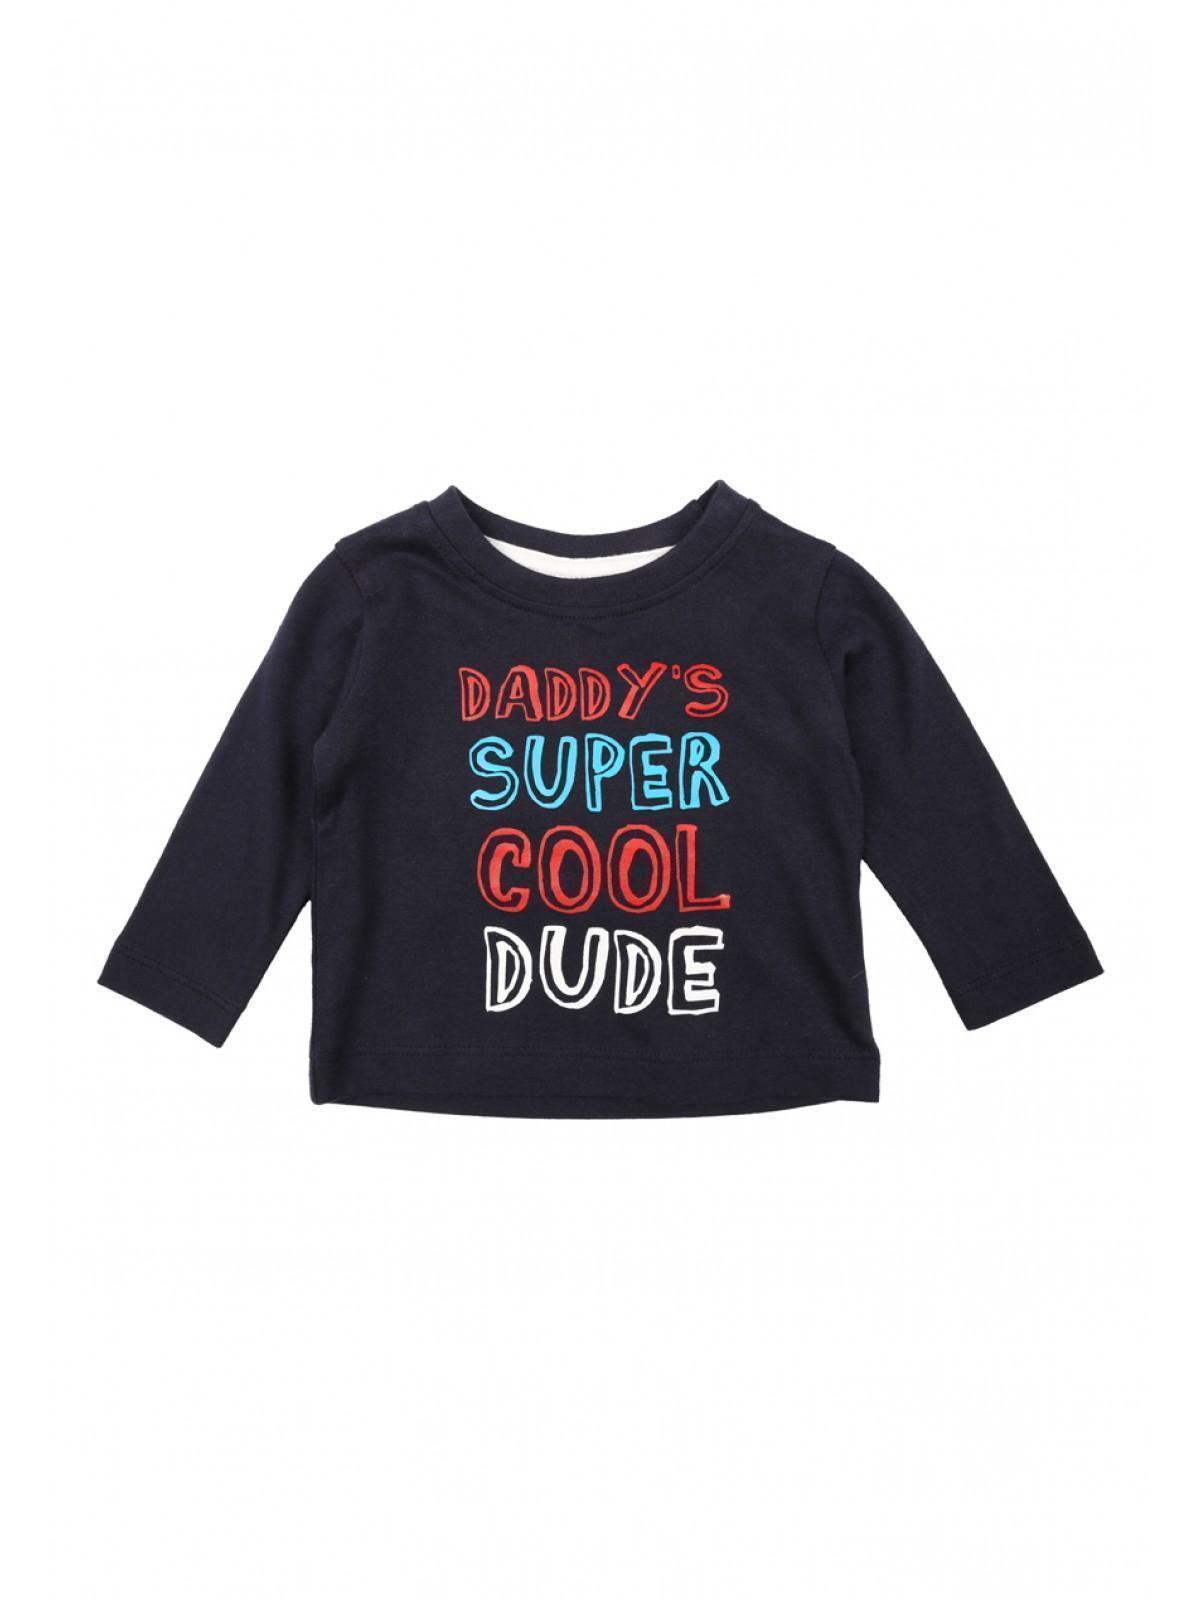 Boys aby Boys Cool Dude T Shirt | Peacocks